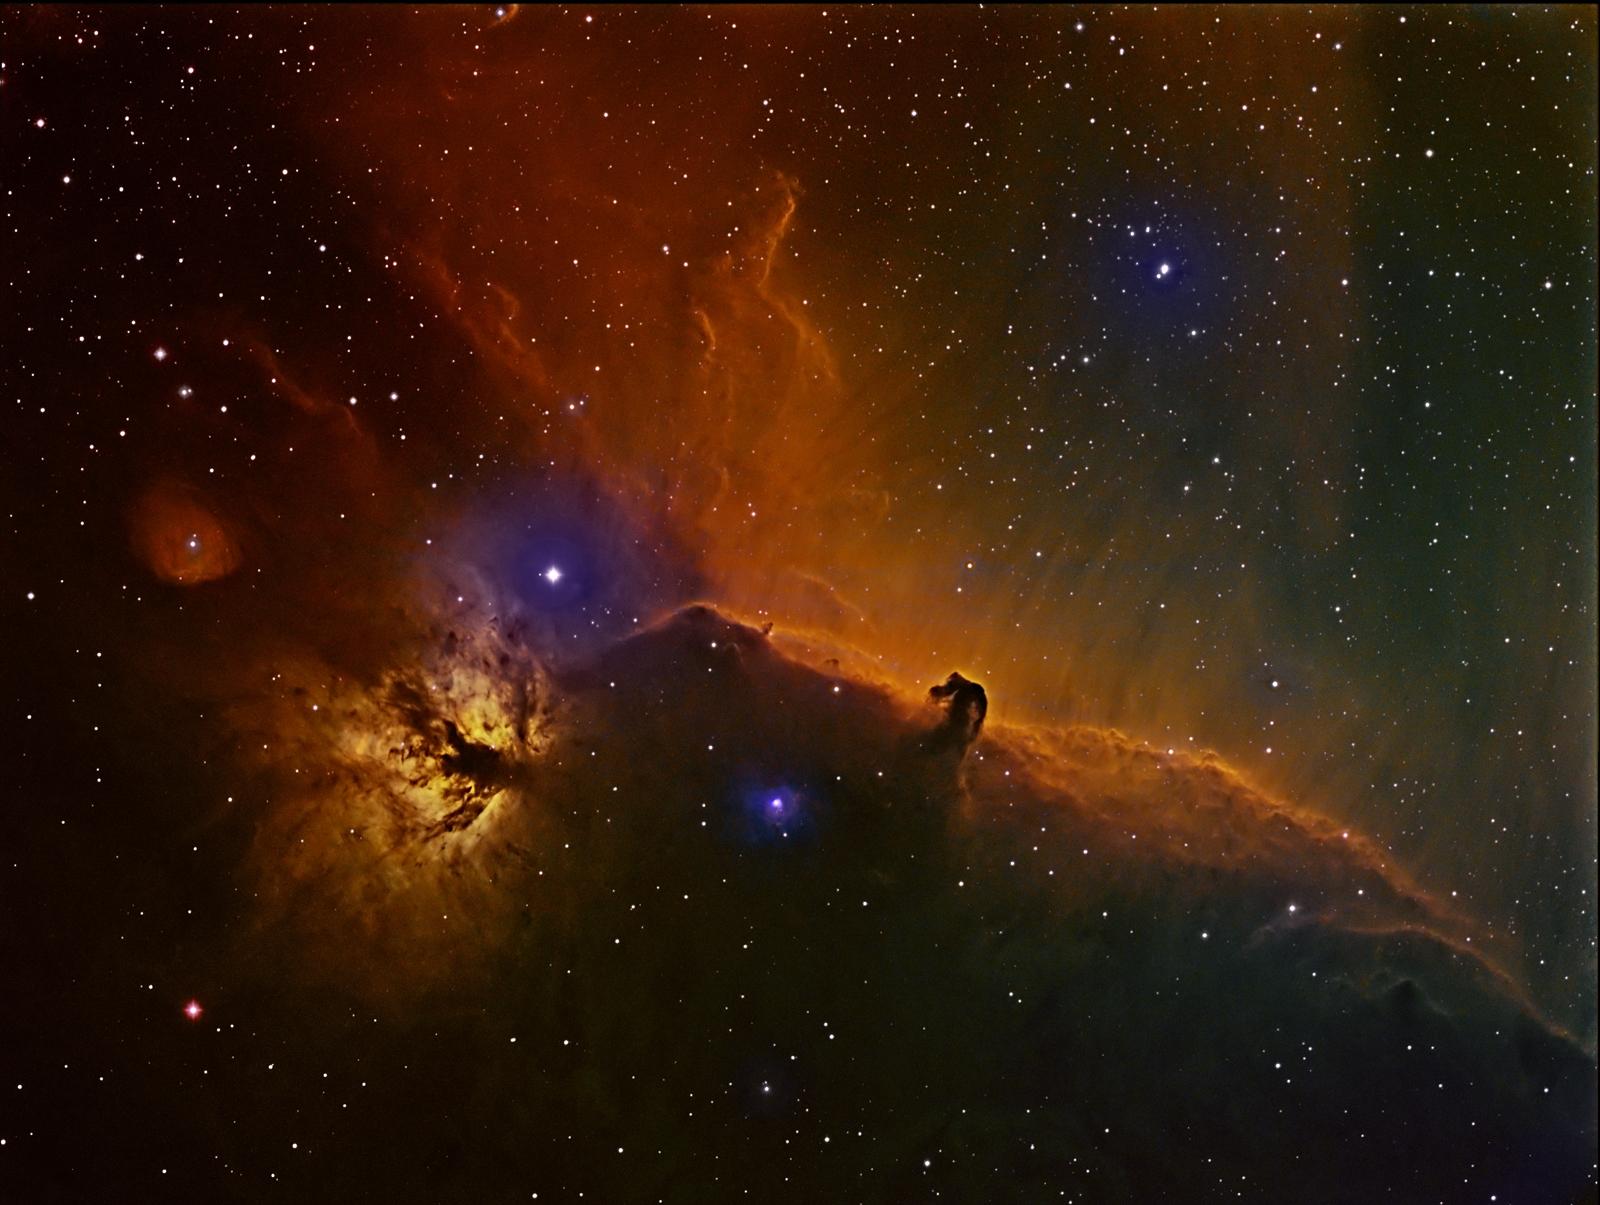 Horsehead and Flame Nebulae by David Ellison